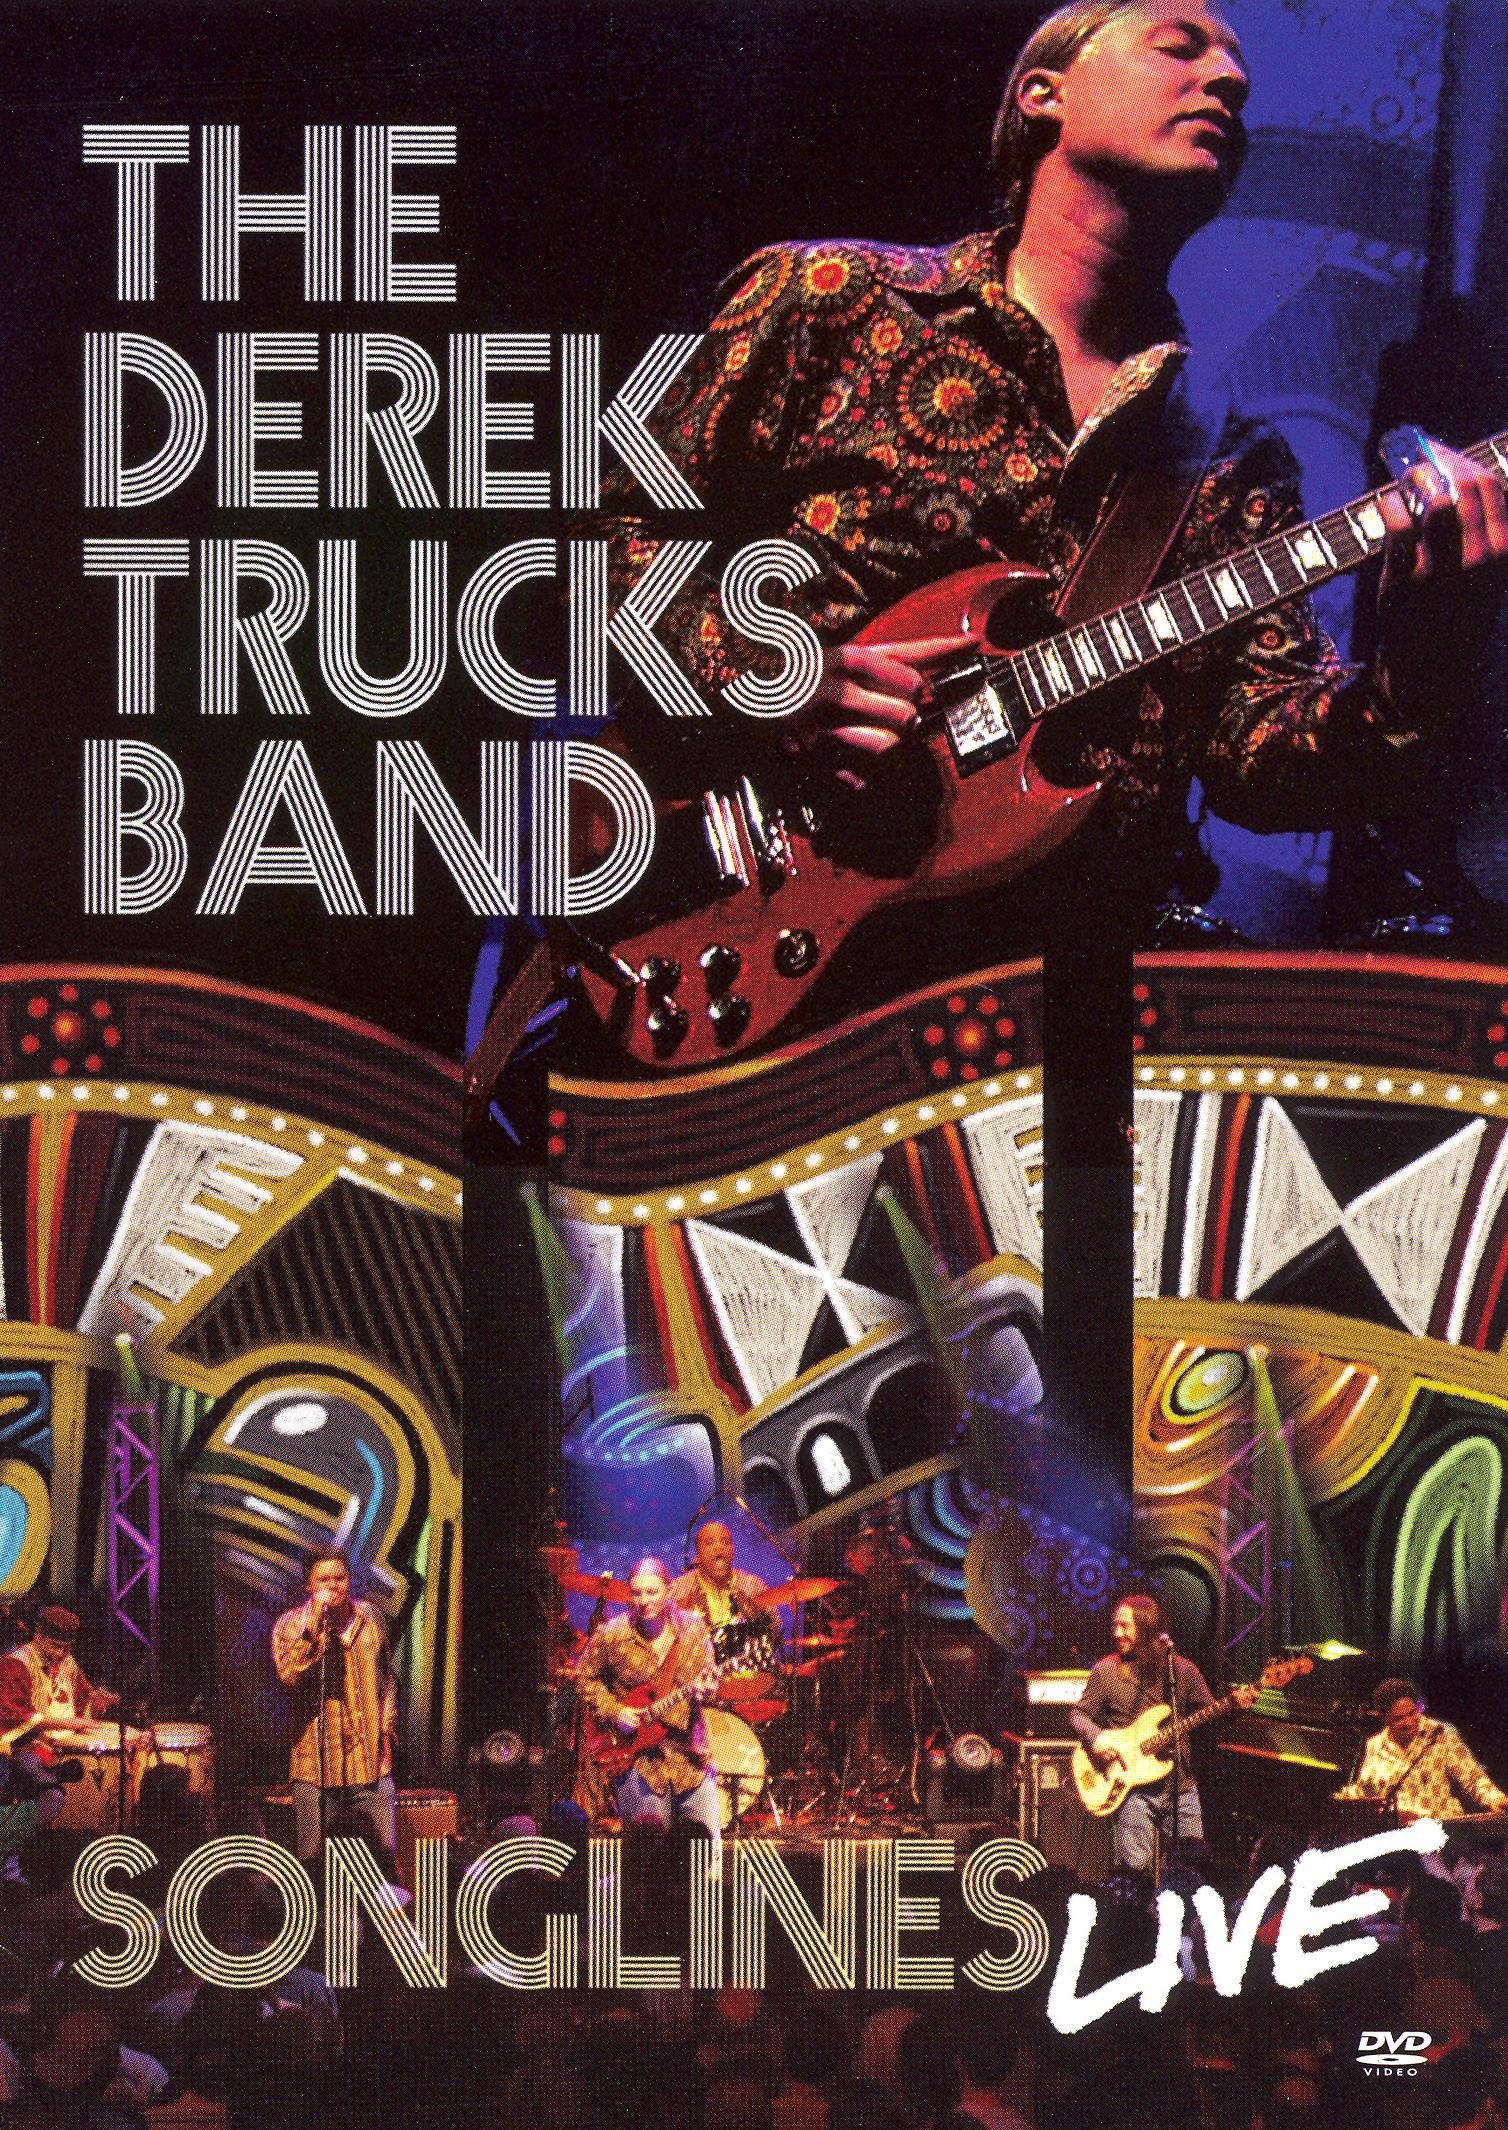 The Derek Trucks Band: Songlines Live